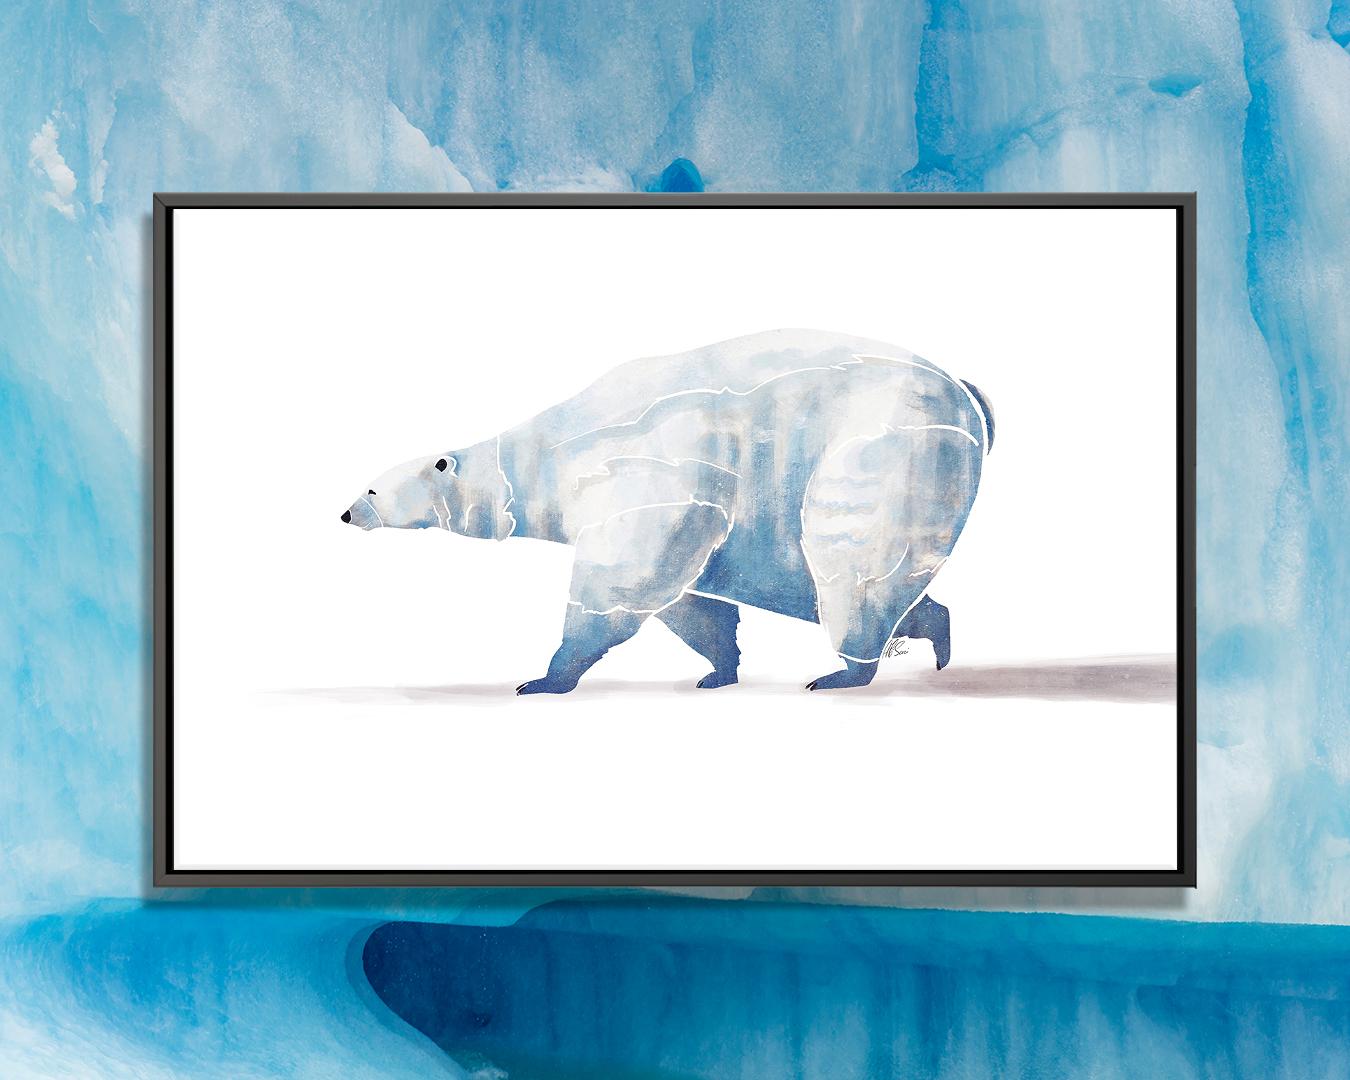 """Polar Bear"" by SAEIART shows a blue polar bear mid-walk against a white background."